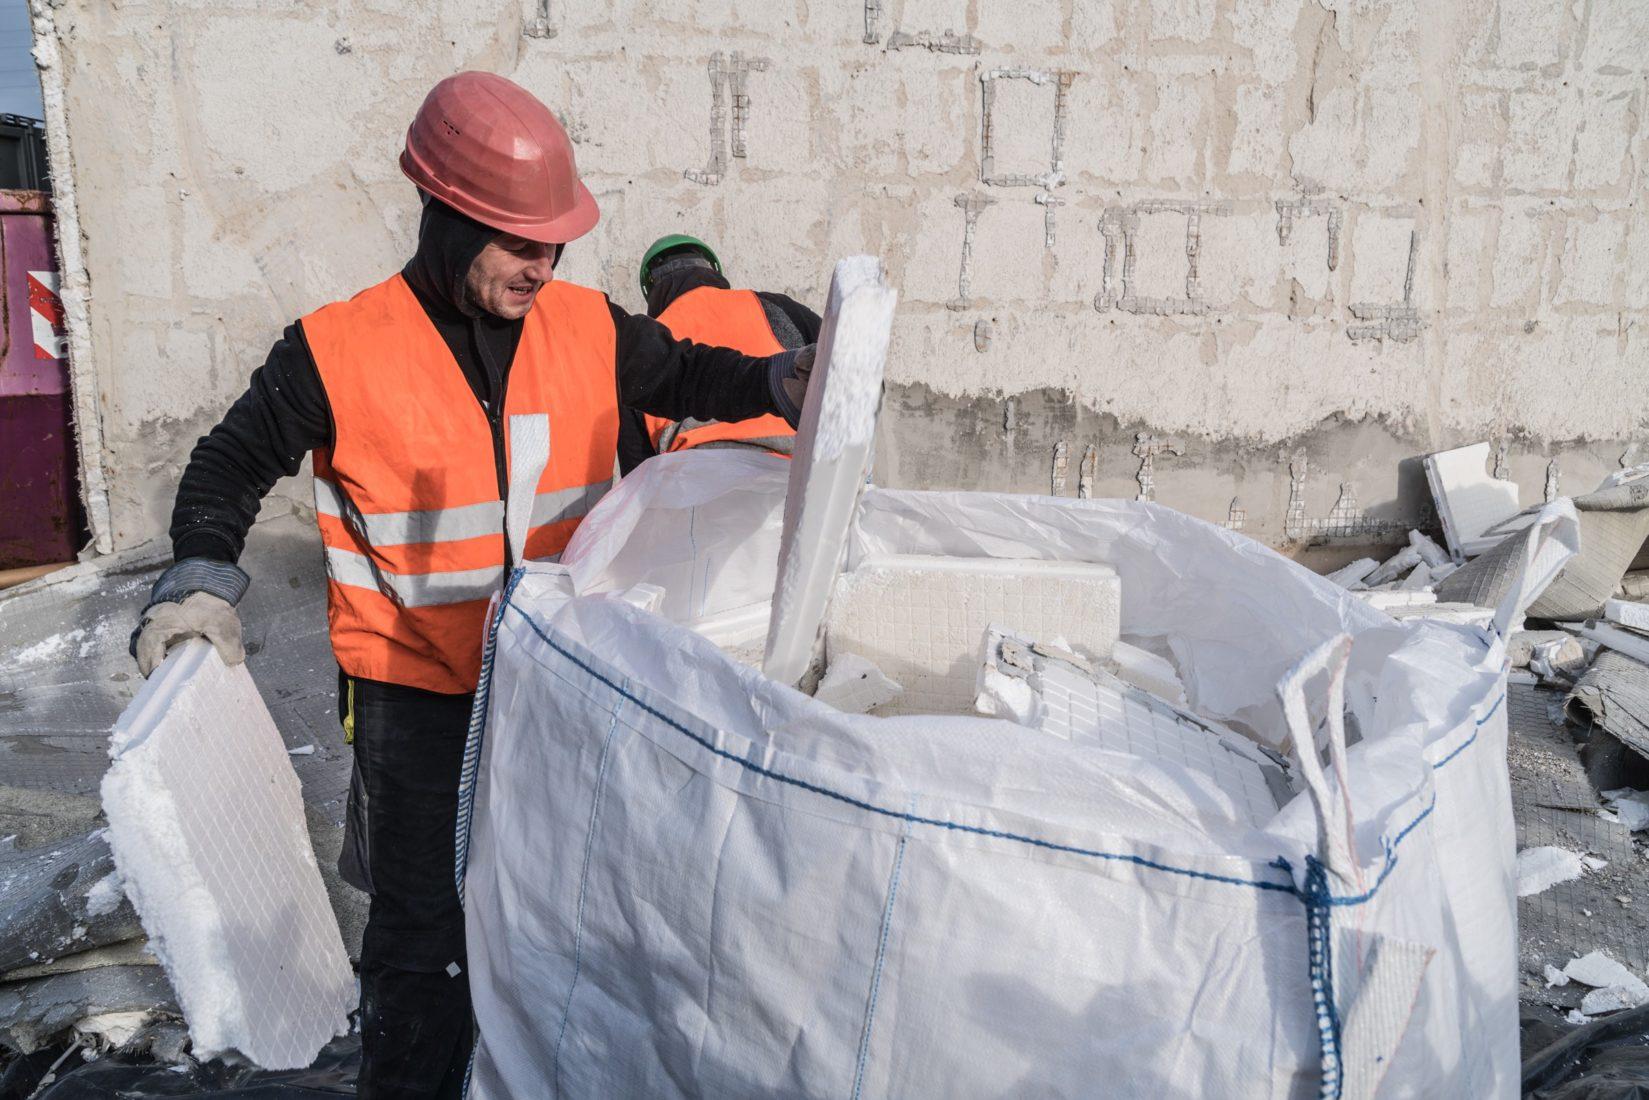 Auch HBCD-belastetes EPS soll künftig recycelbar sein. Foto: BASF